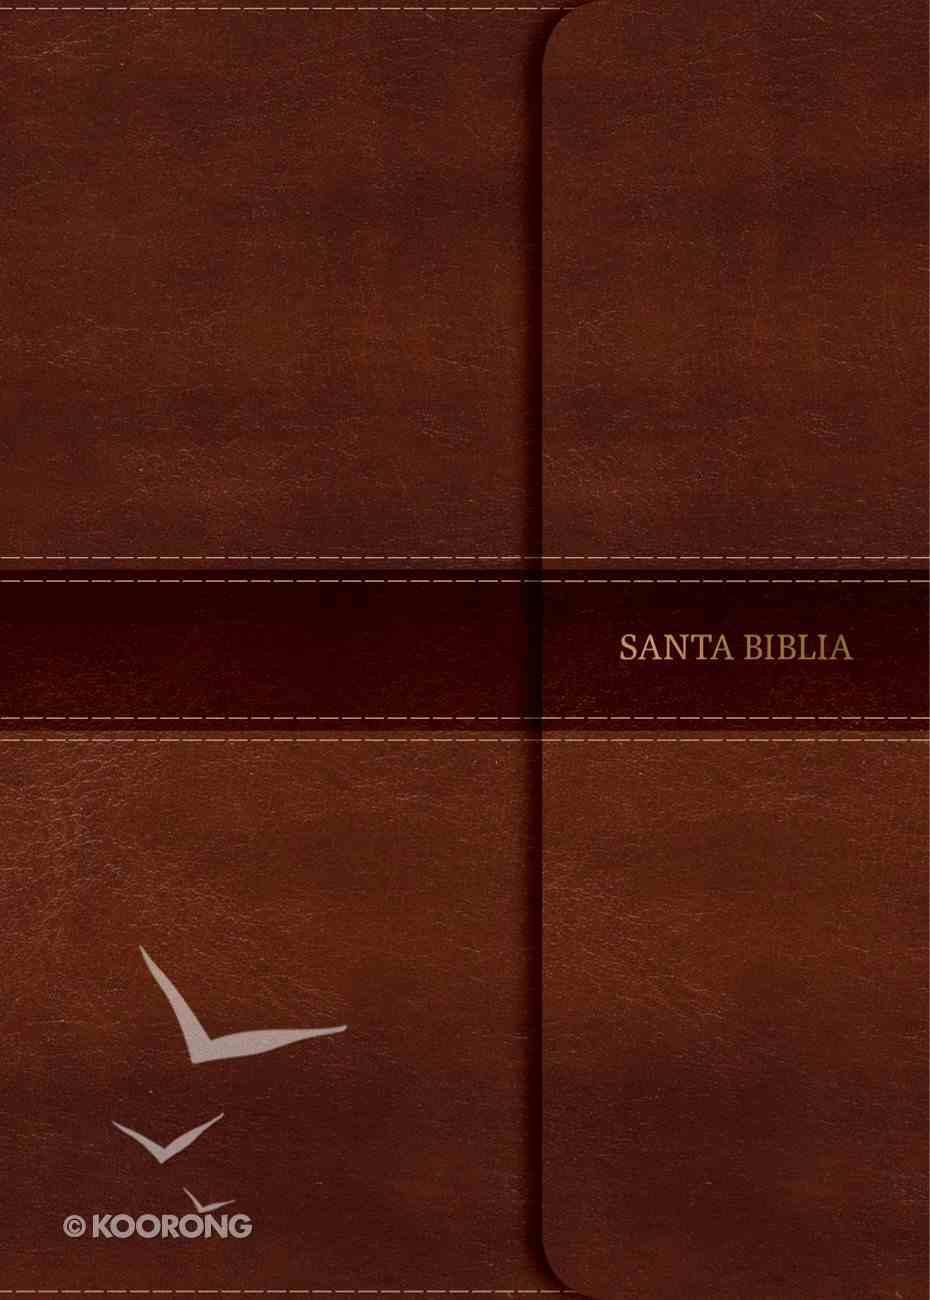 Nvi Biblia Letra Super Gigante Marron Indice Y Solapa Con Iman (Super Giant Print Indexed Magnetic Flap) Imitation Leather